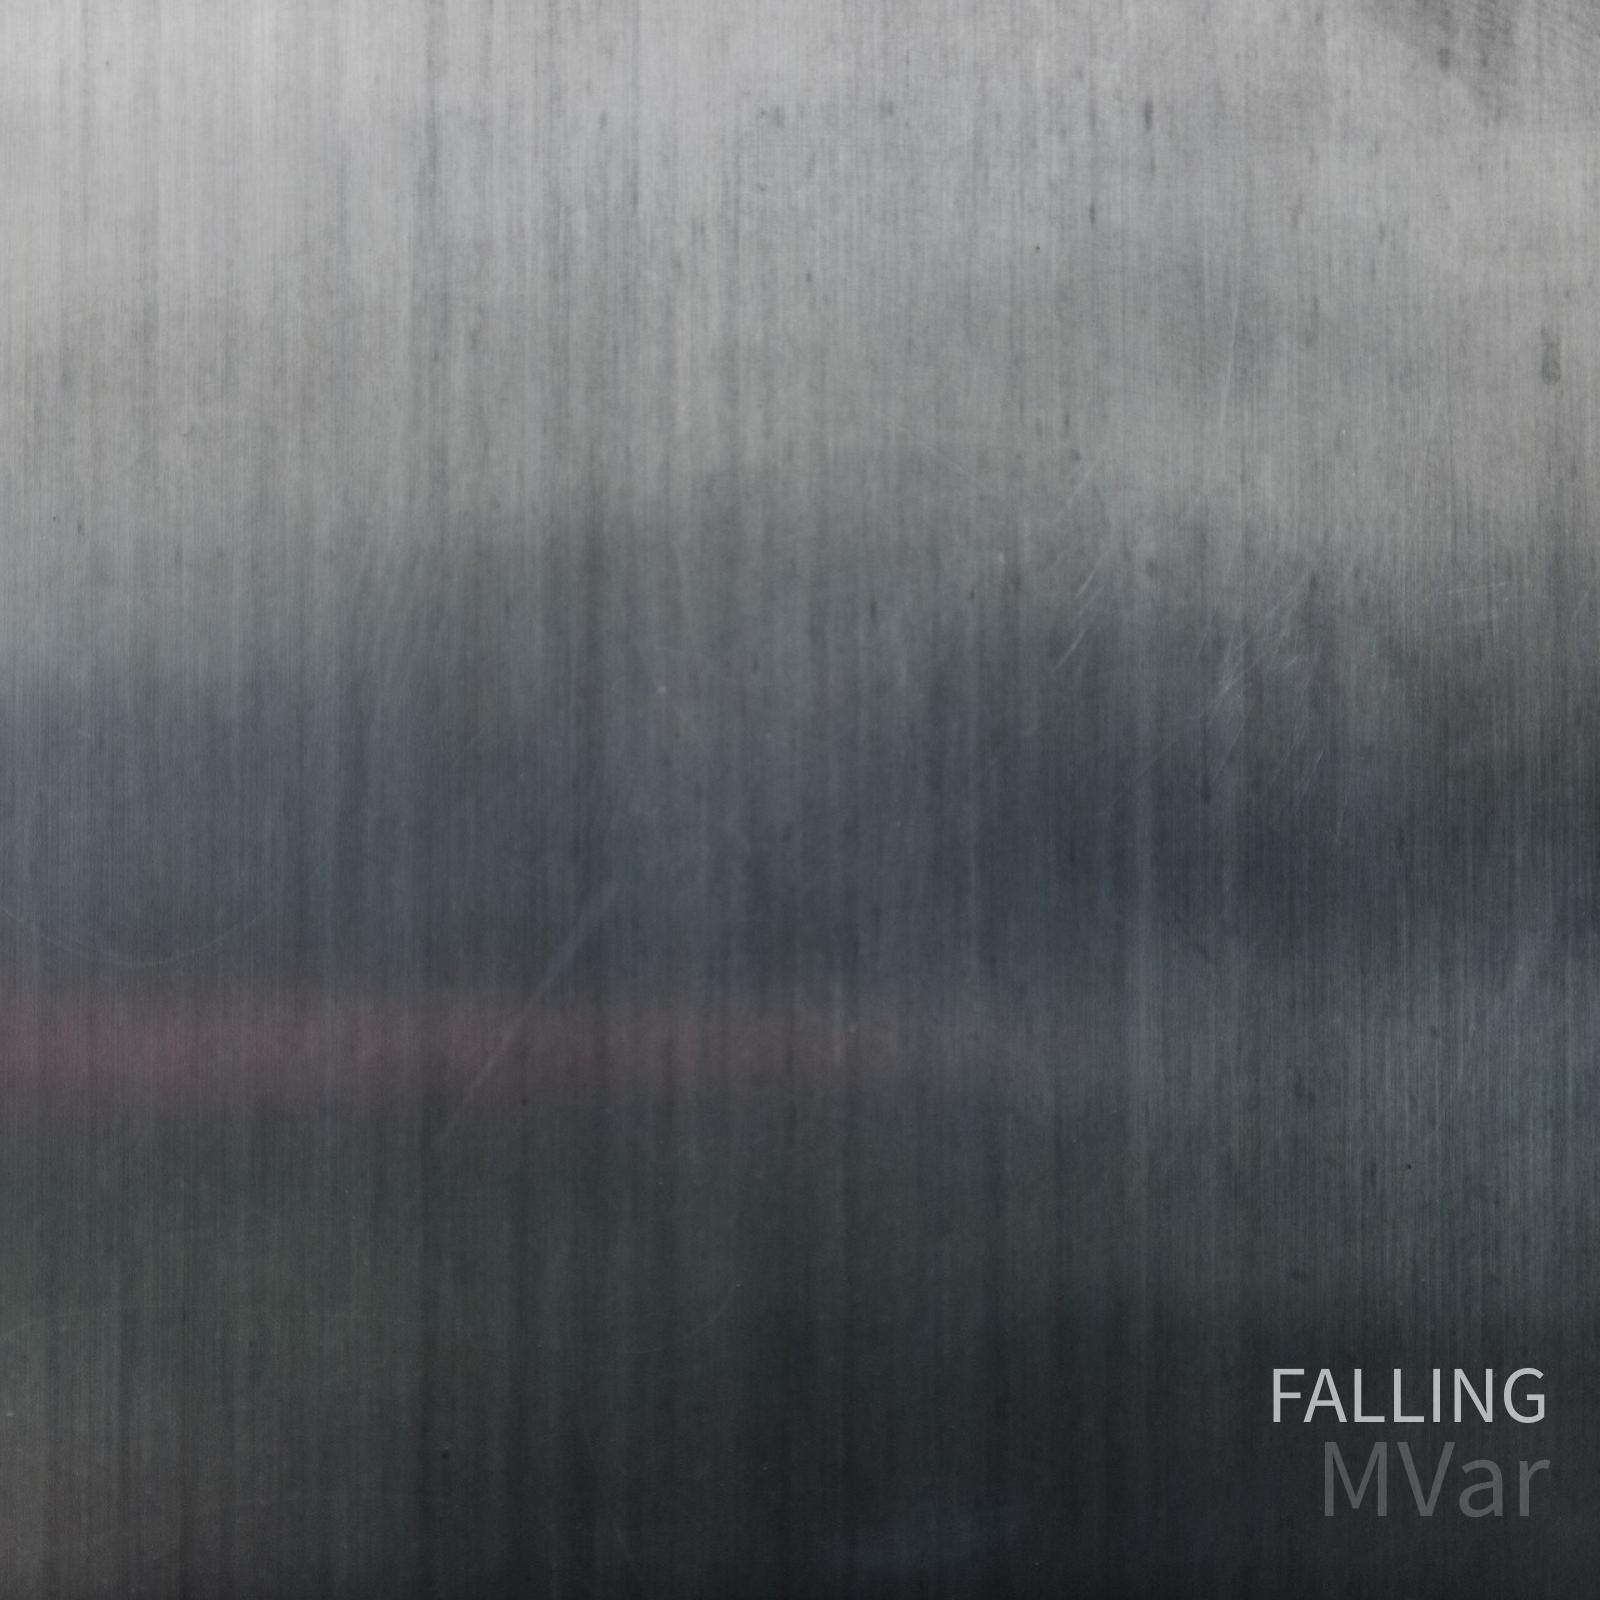 MVar – Falling